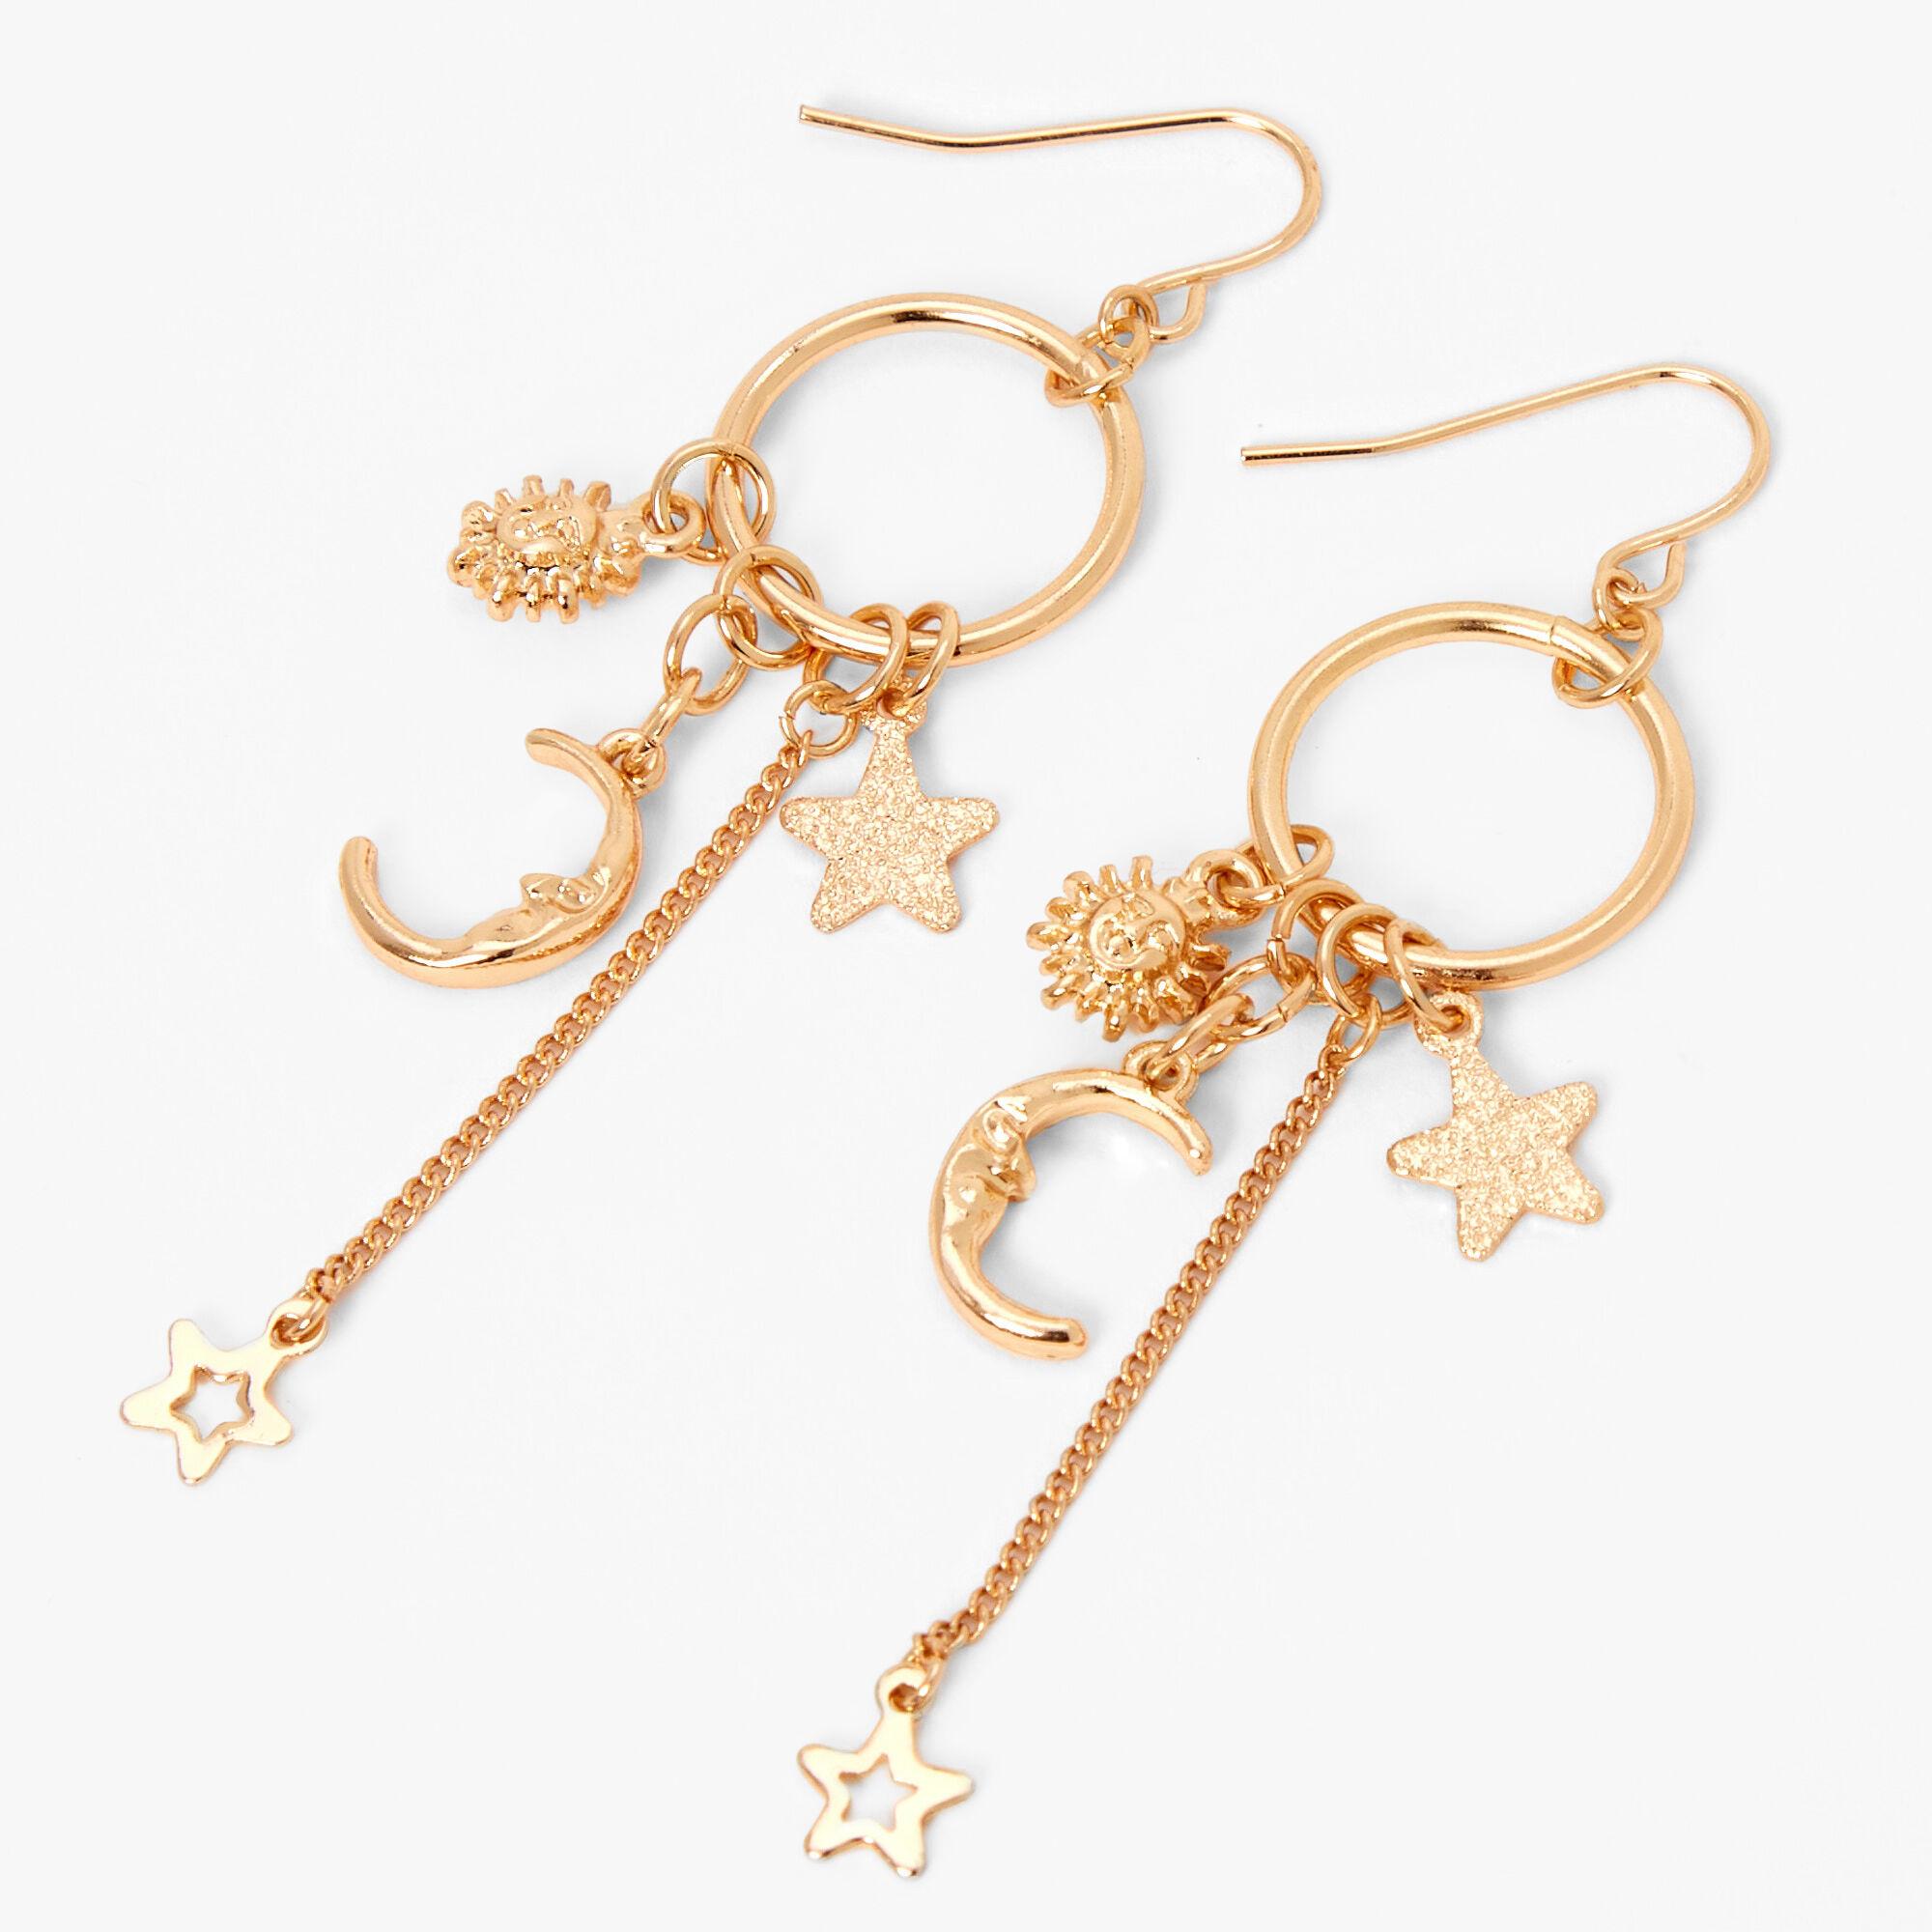 ec134c817d2de Kiss Me Mistletoe Headband